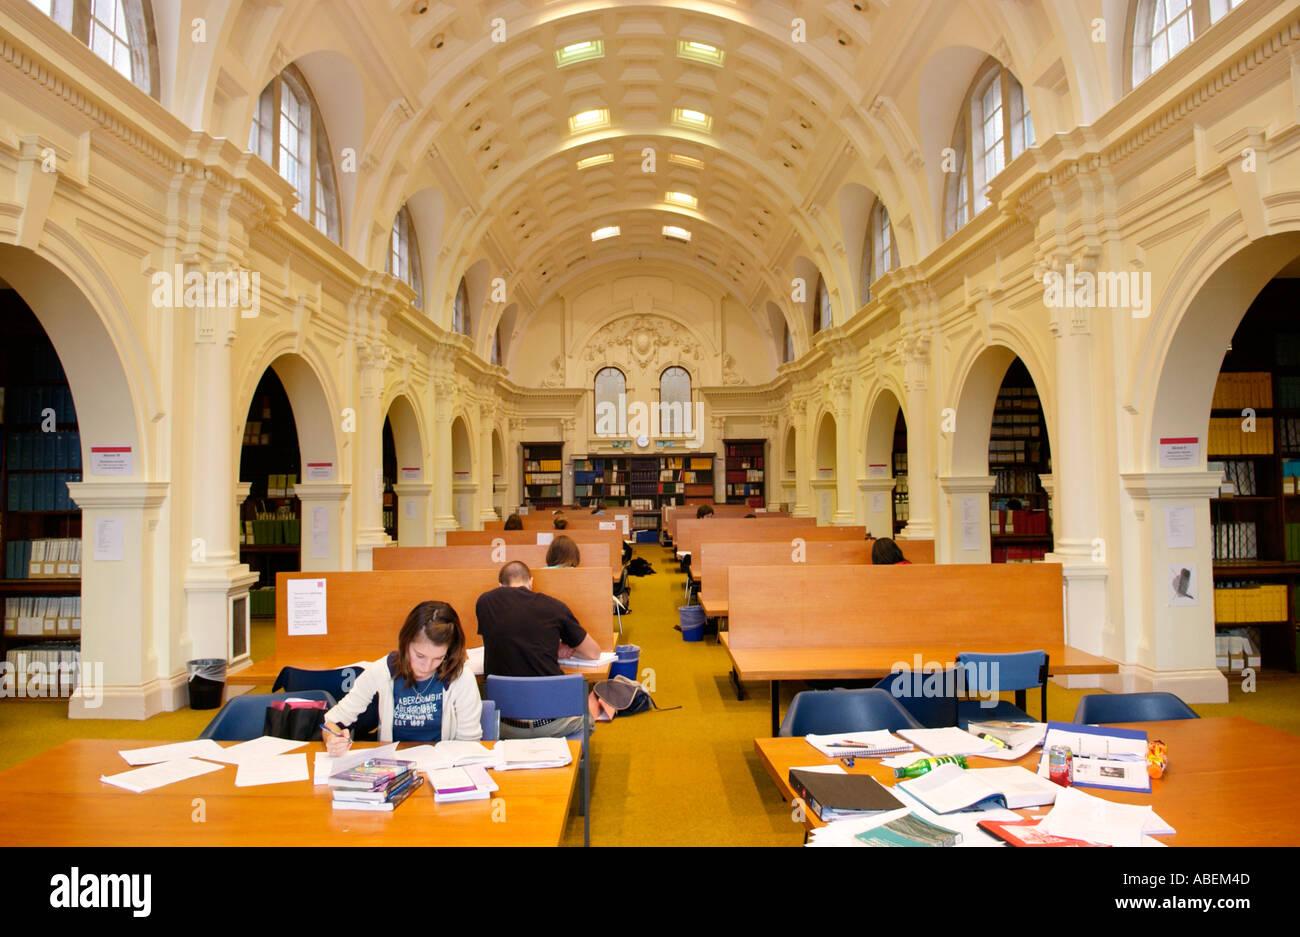 Cardiff University Main Building Library